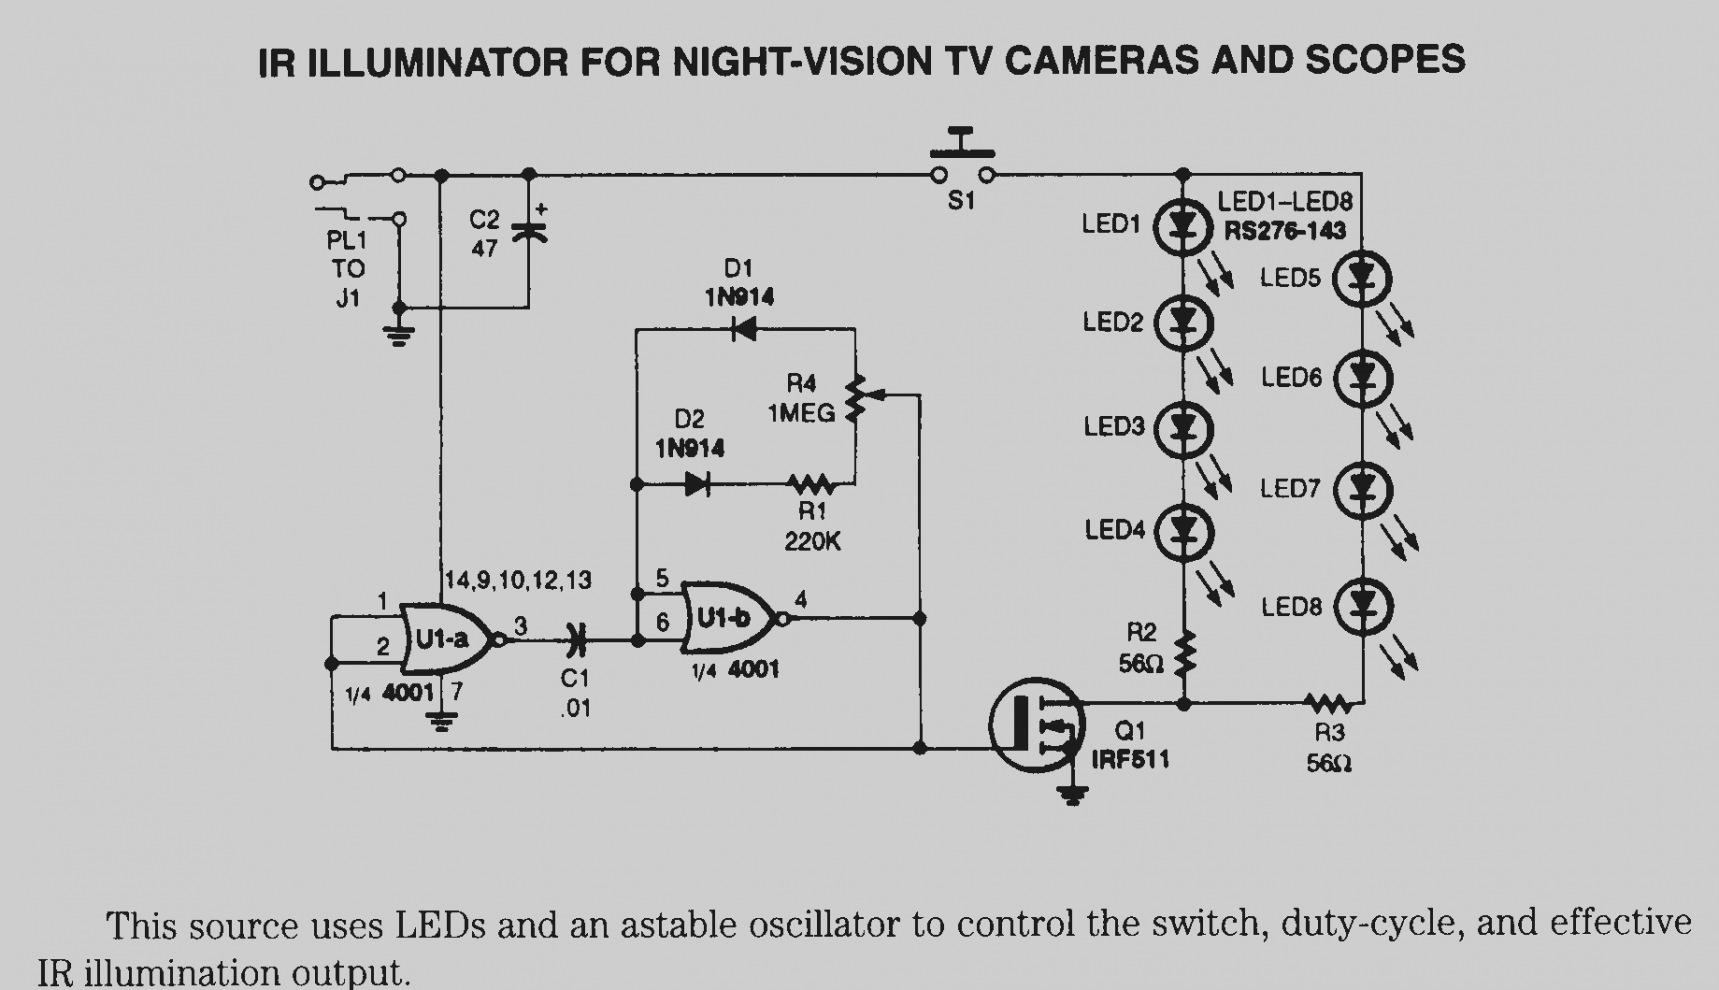 X10 Video Cam Wiring Diagram | #1 Wiring Diagram Source on